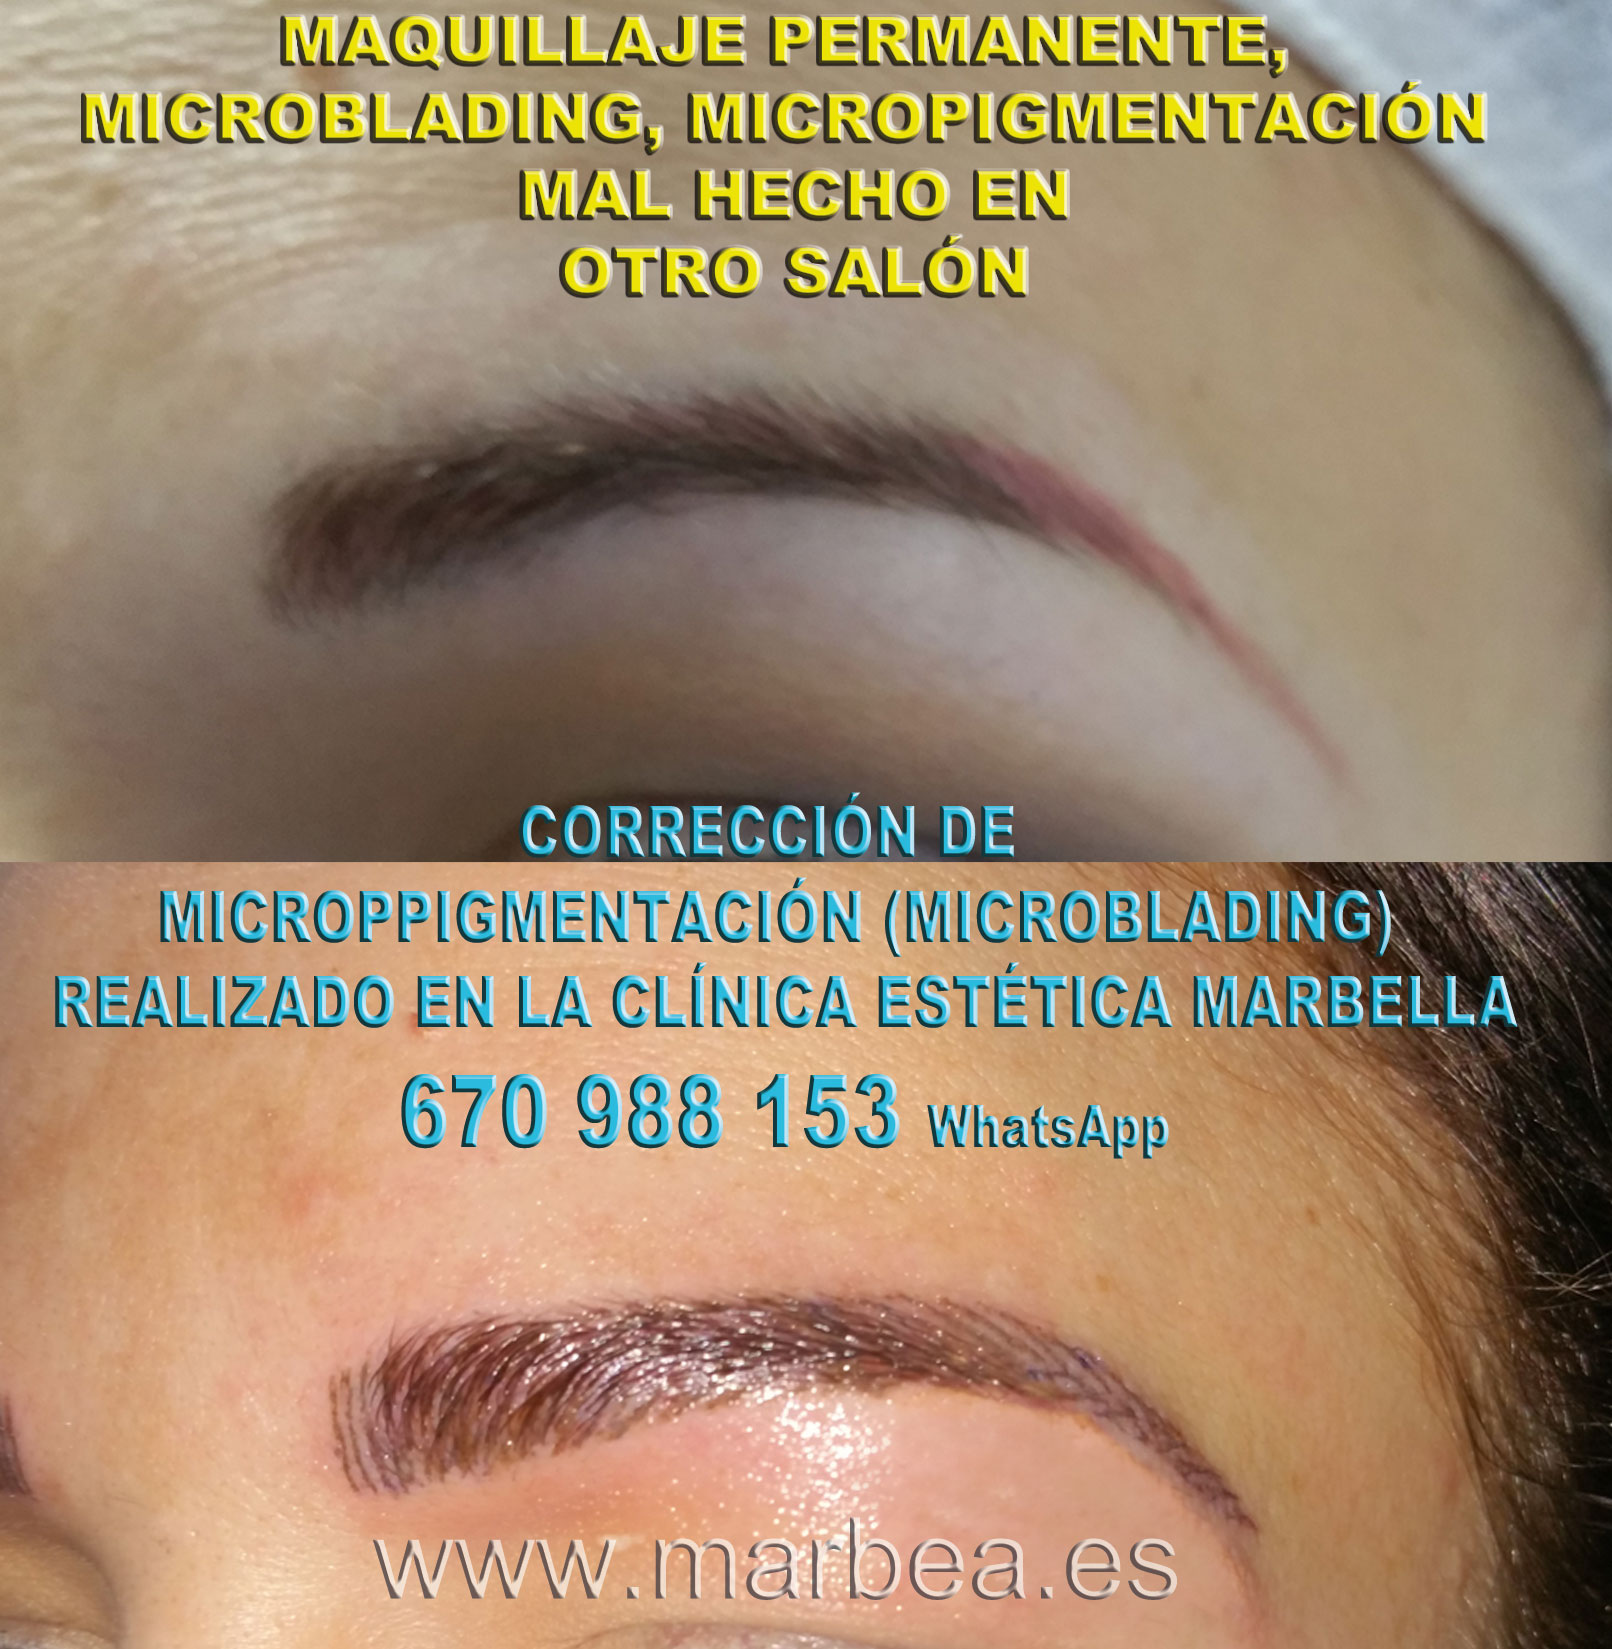 Borrar maquillaje permanente mal hecha clínica estética maquillaje semipermanente propone micropigmentacion correctiva de cejas,corregir micropigmentación no deseada